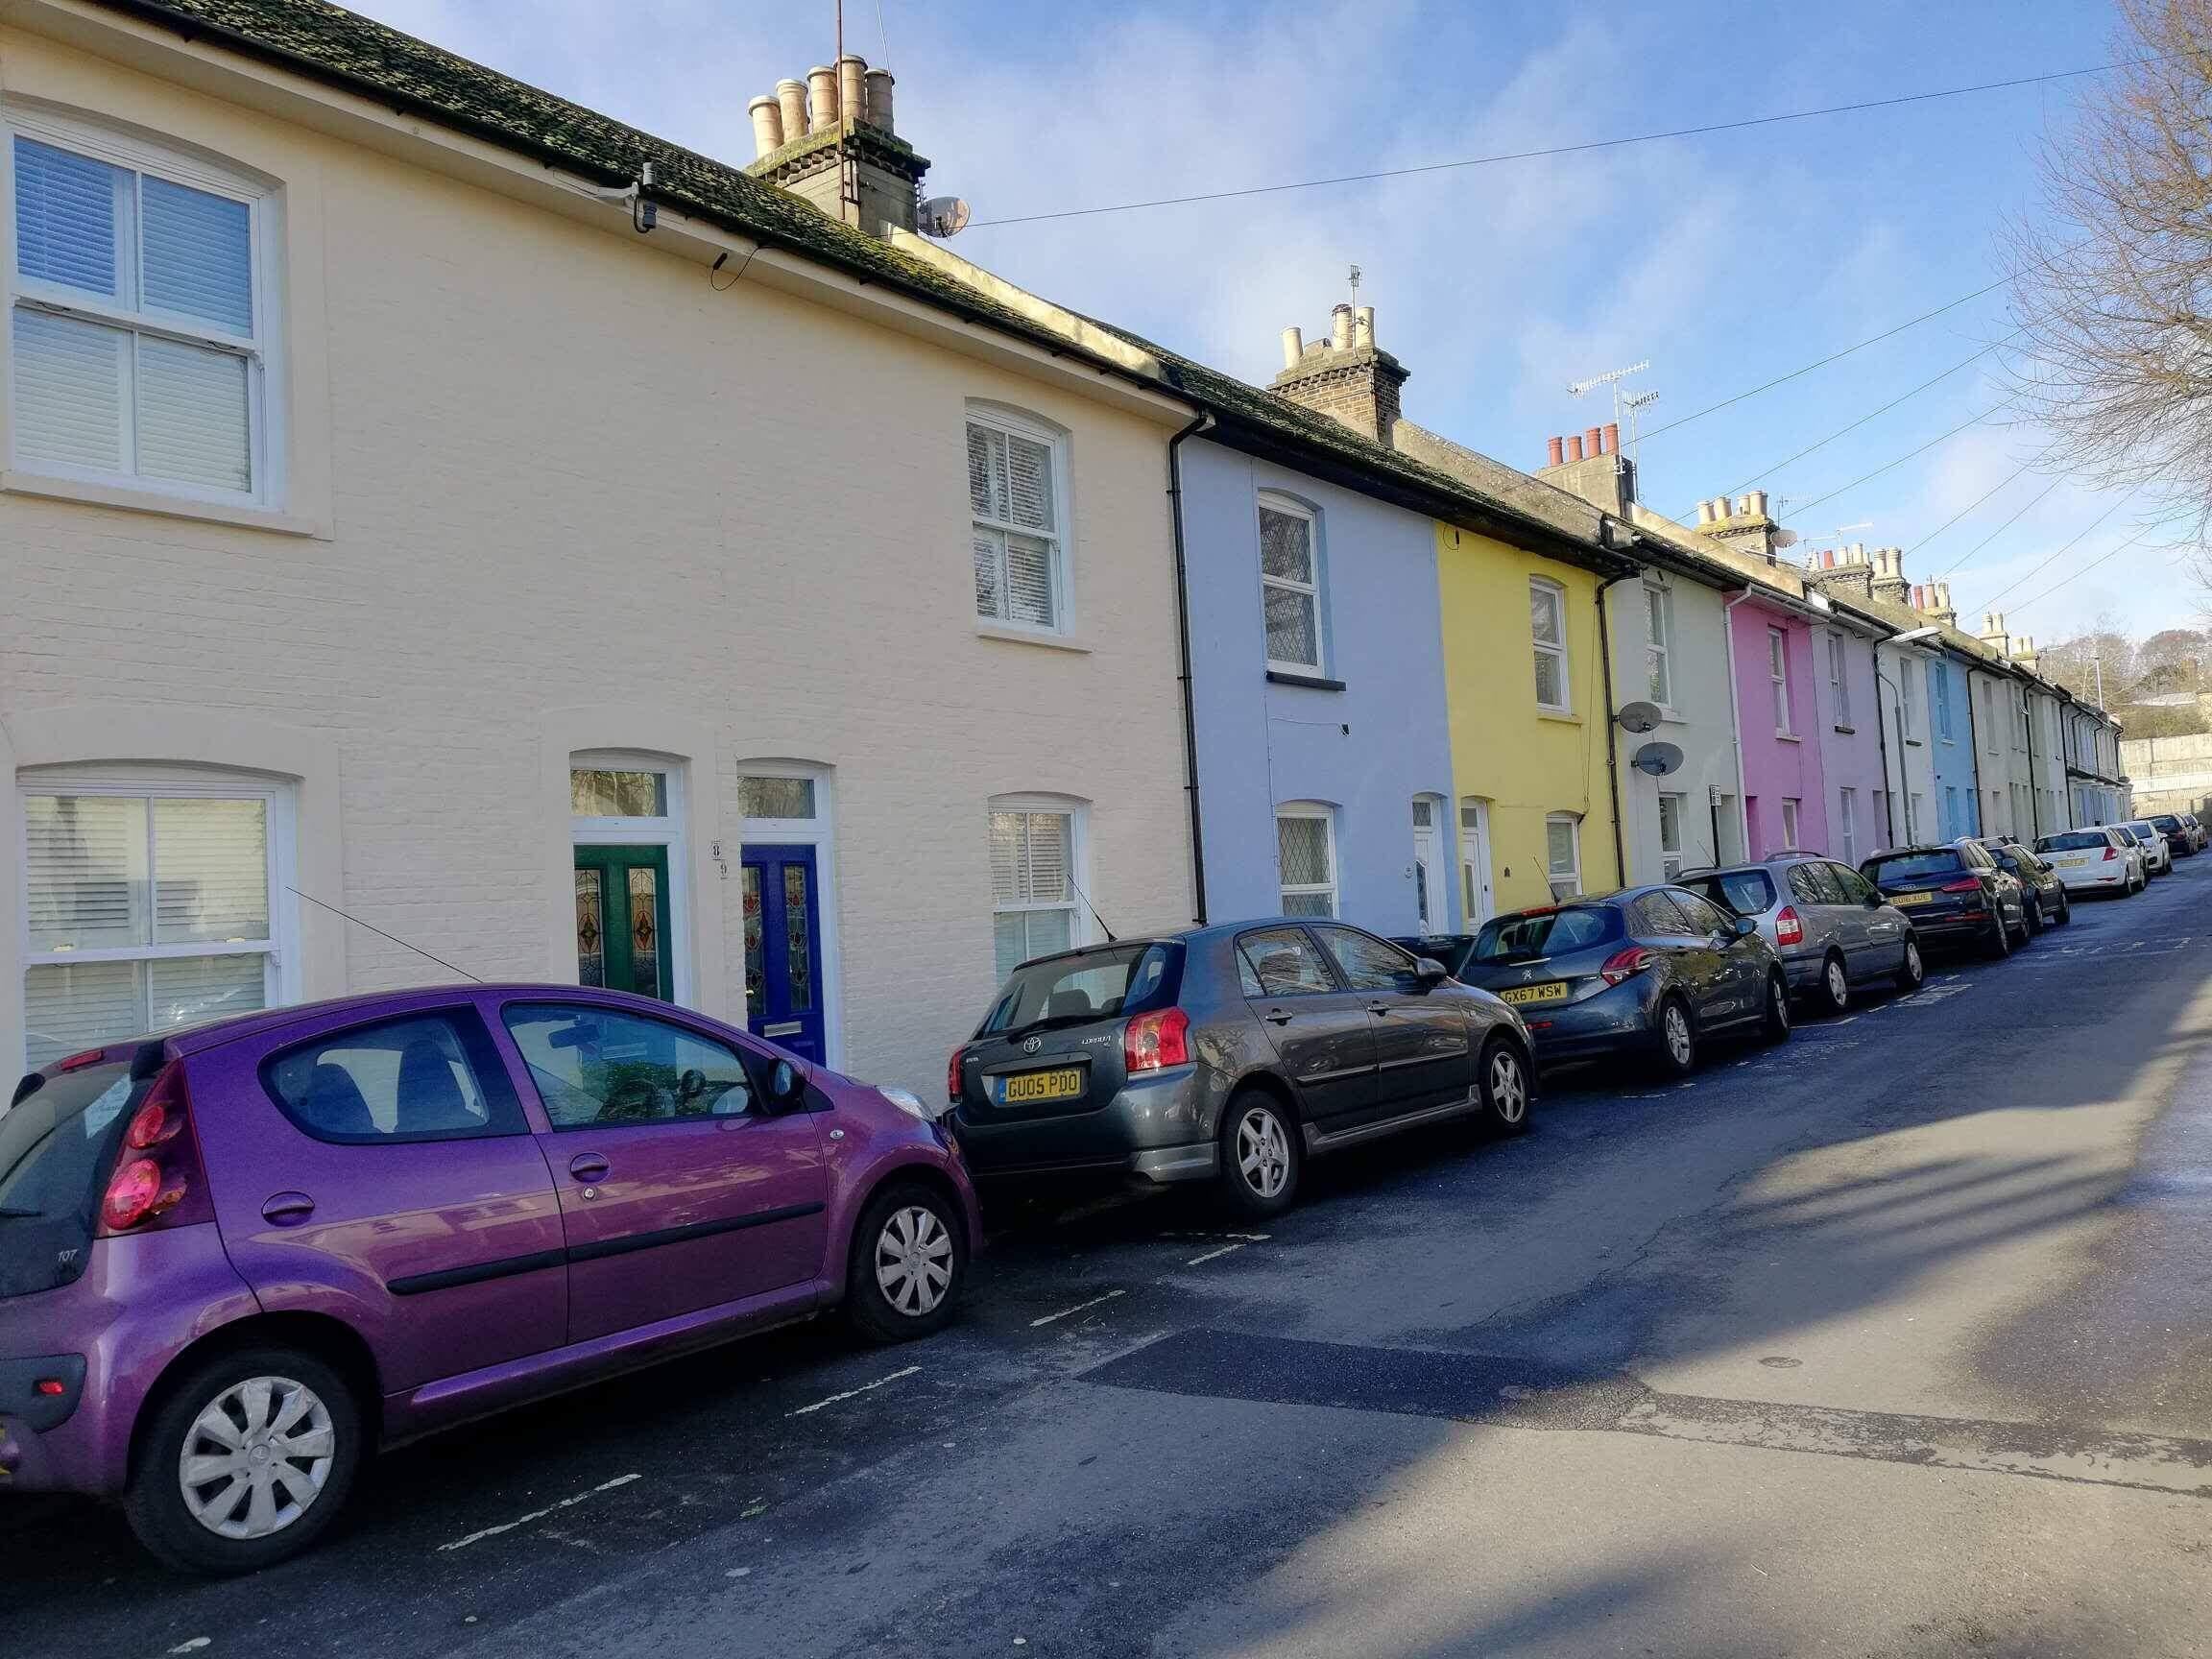 Portslade street (1)